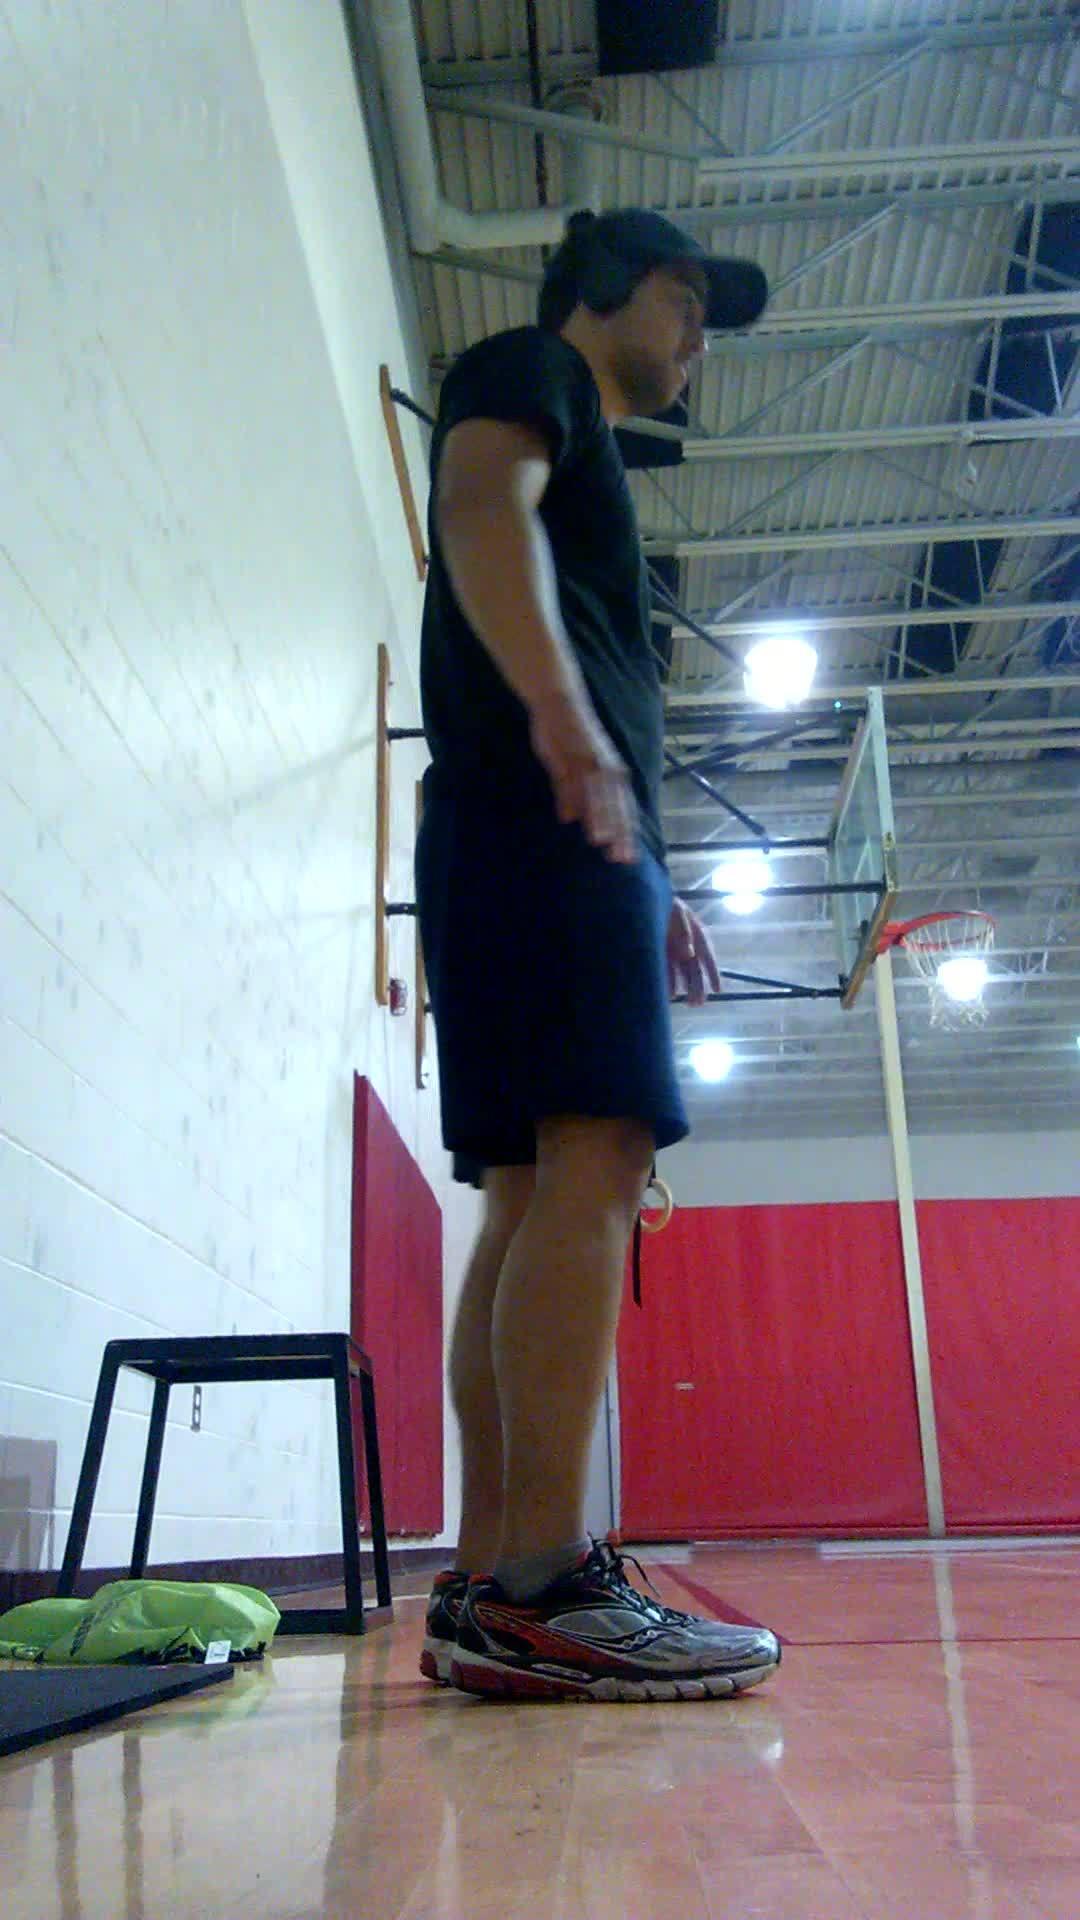 bodyweightfitness, Pistol Squat GIFs